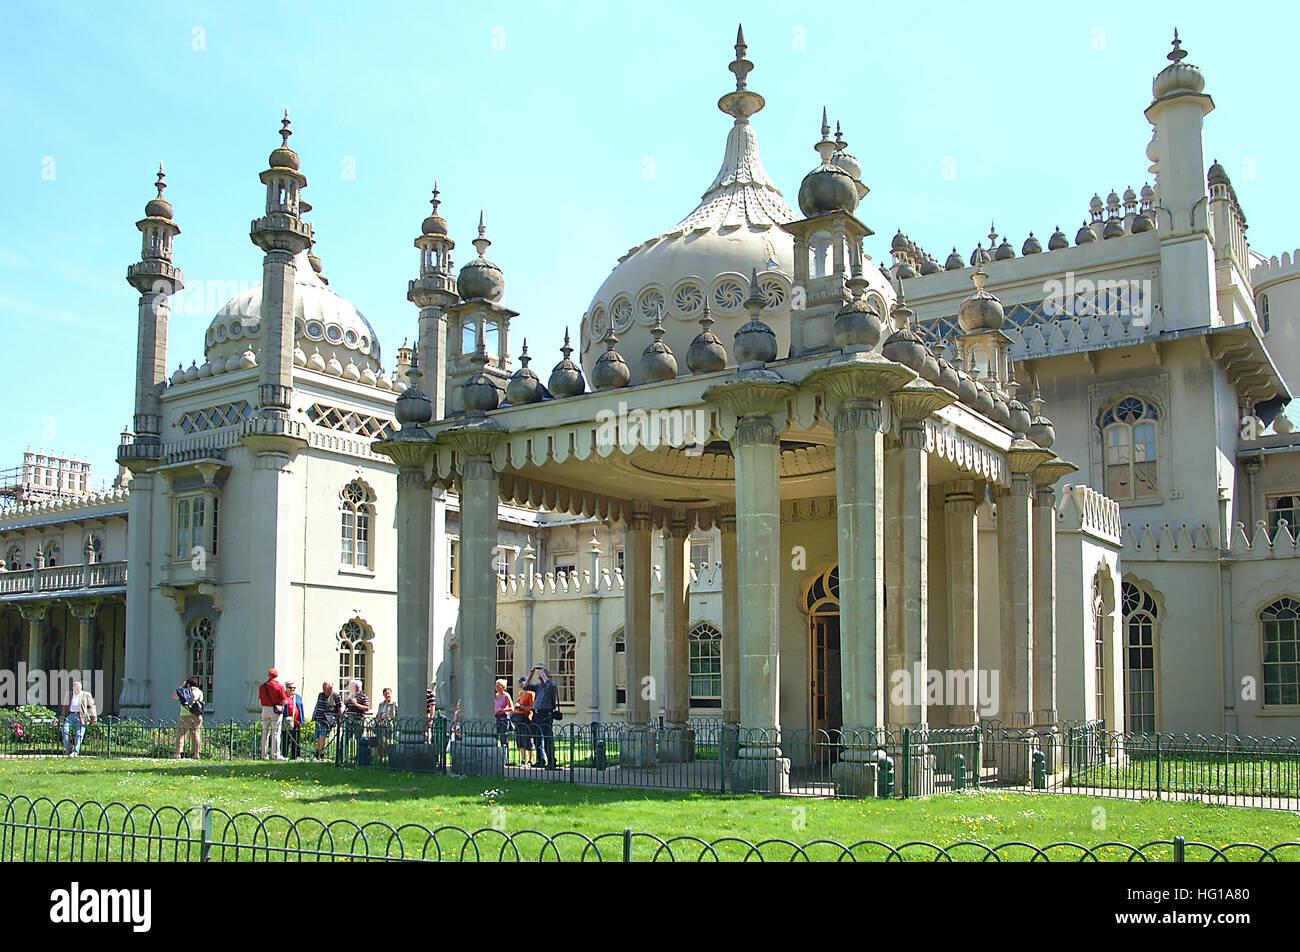 Visitors waiting to view inside Brighton Royal Pavilion. - Stock Image